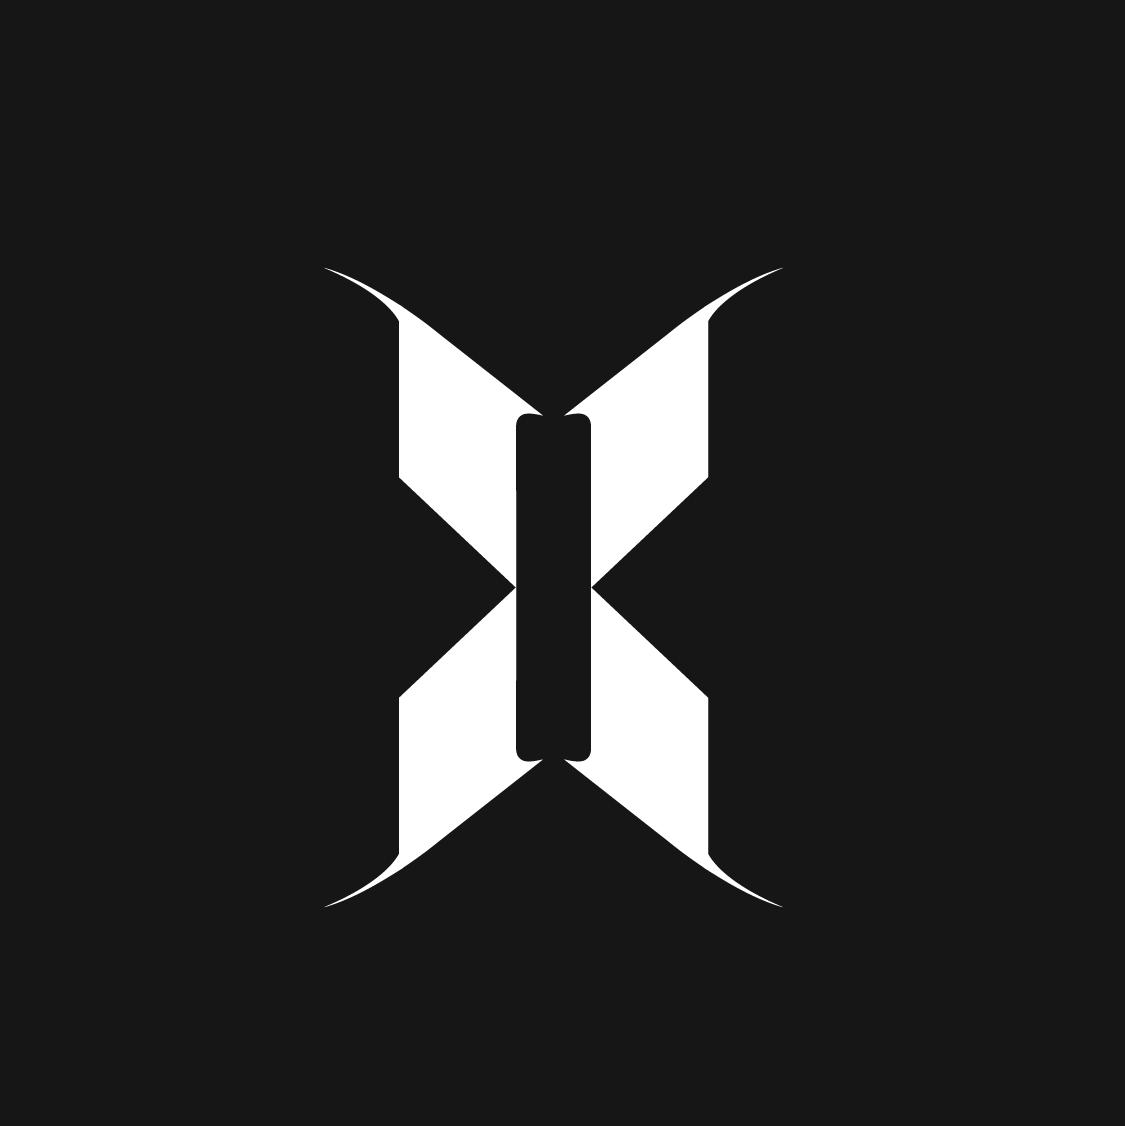 all-logos-2020-51